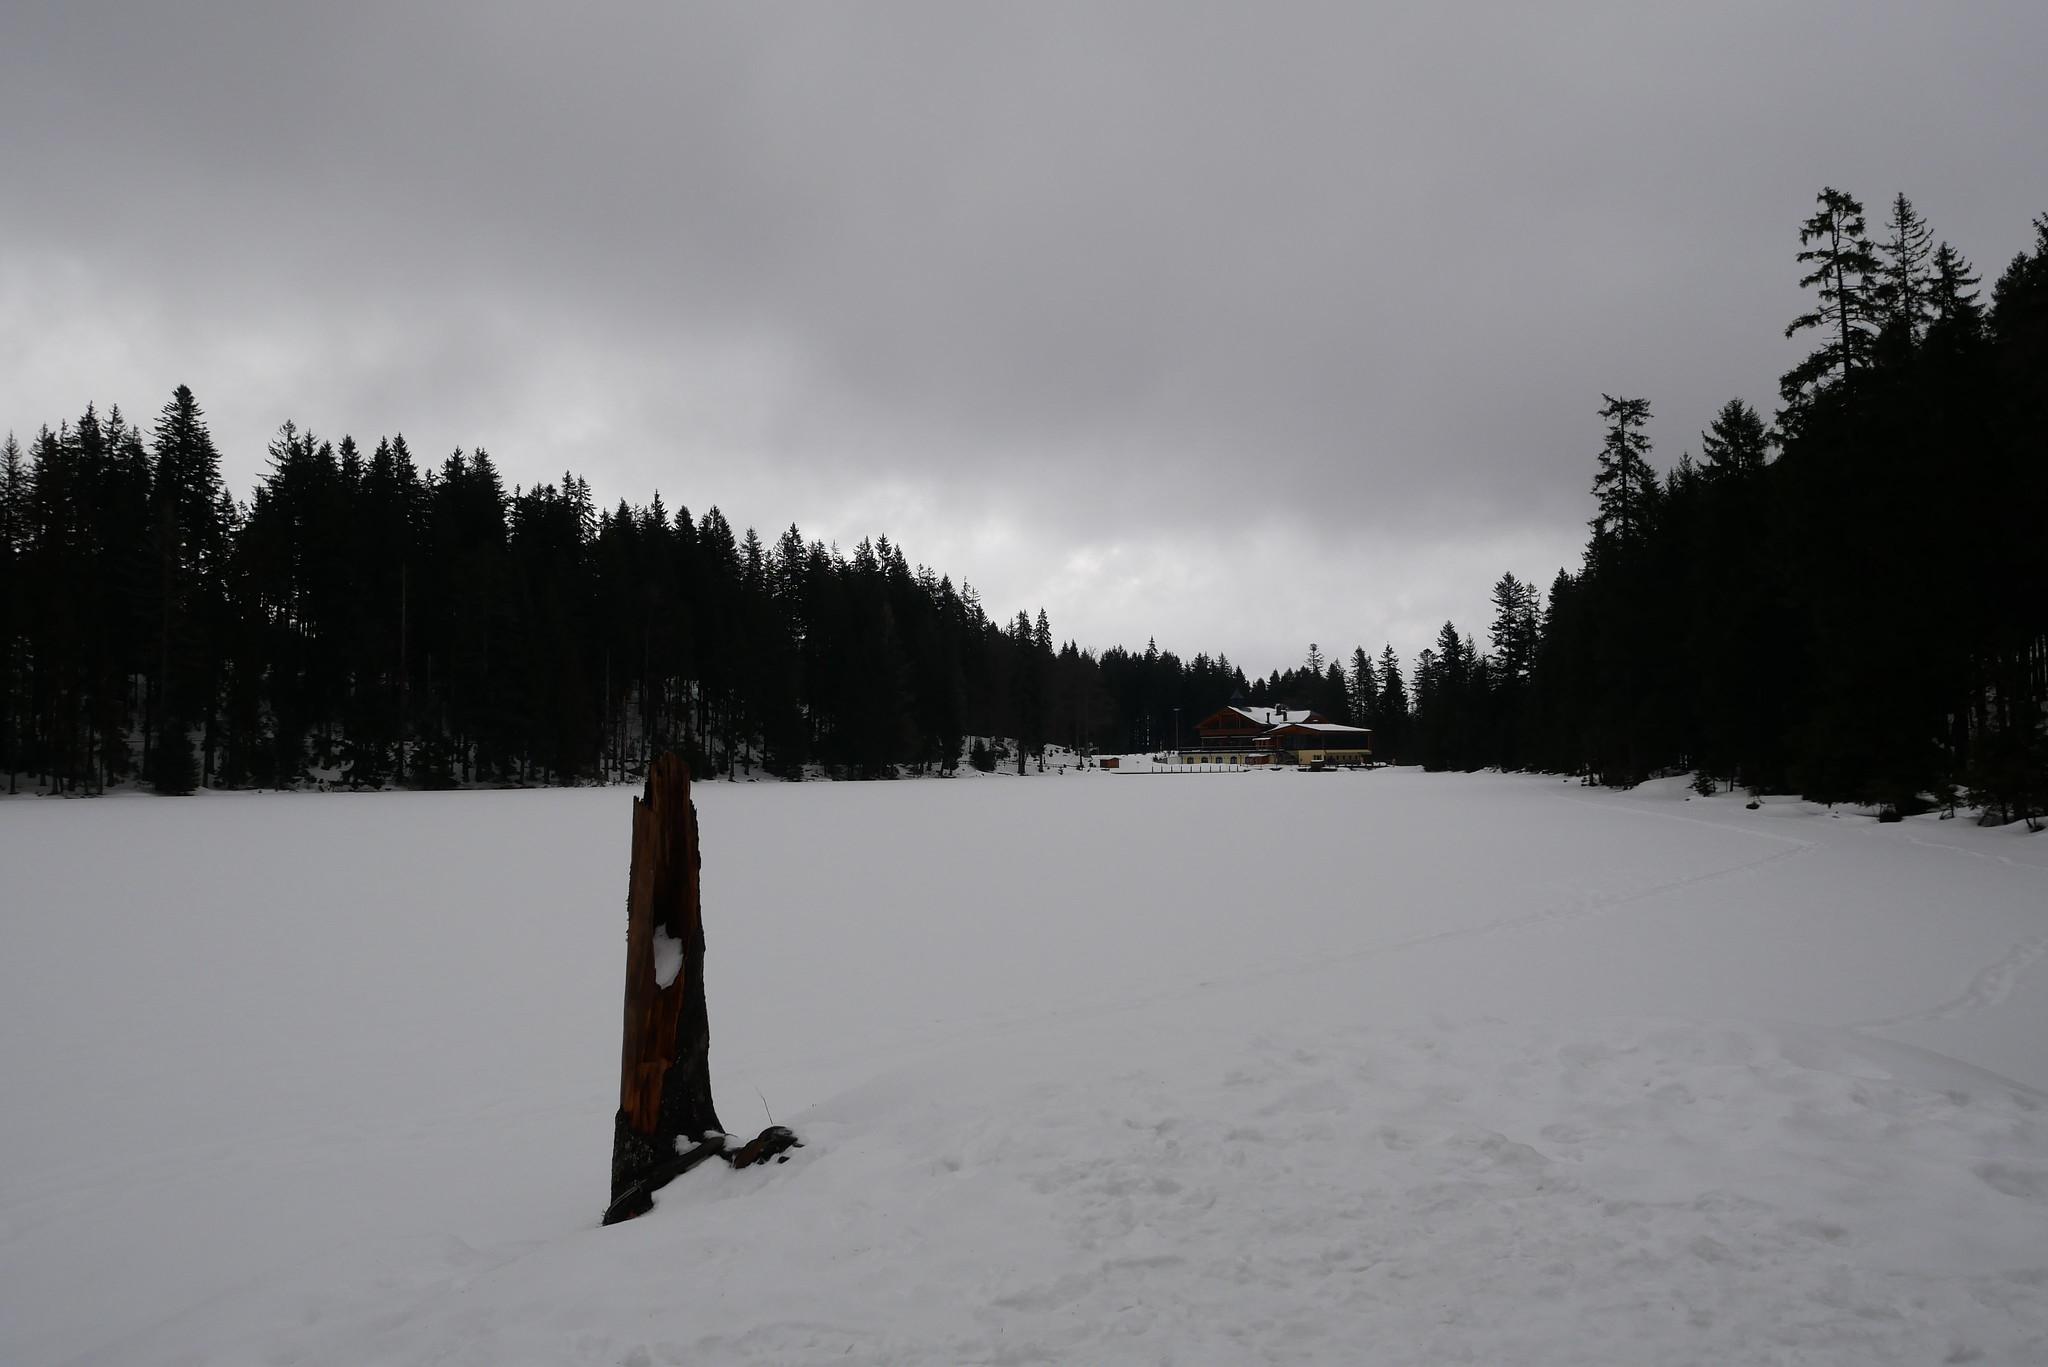 leil.de/di/pics/arbersee_arberseehaus_im_winter_21-1.jpg